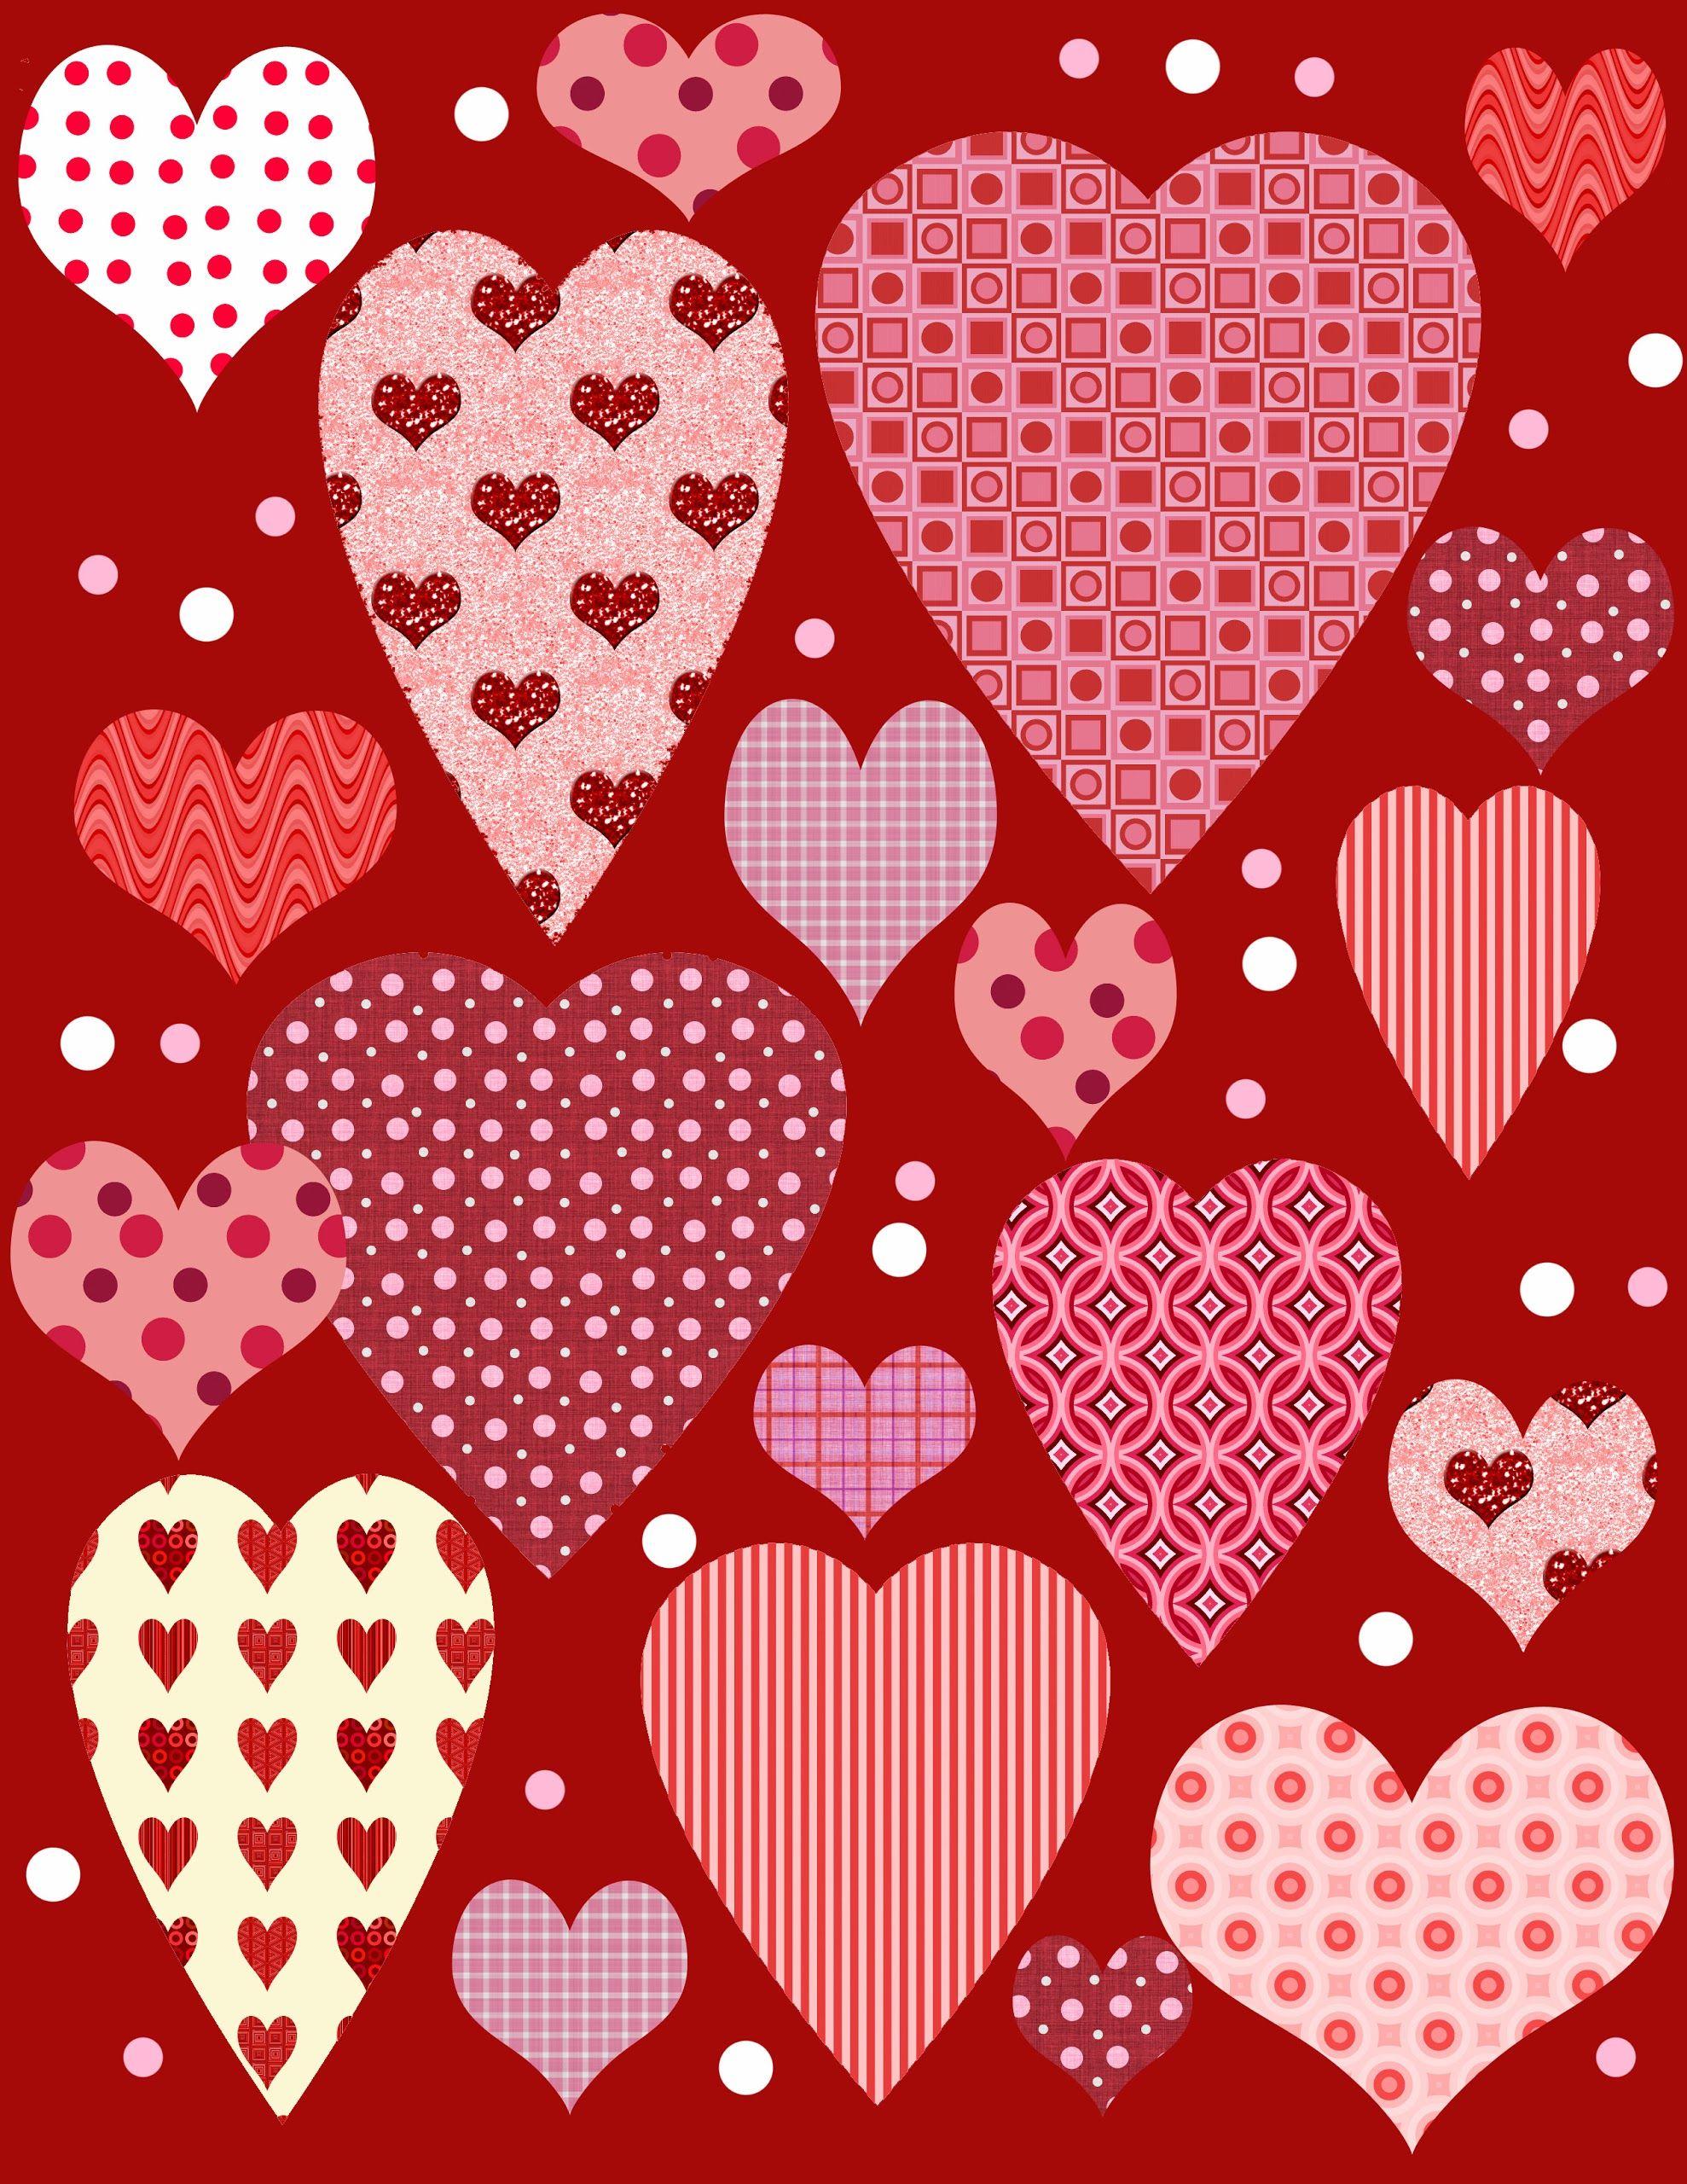 Pin By Terri On Valentine